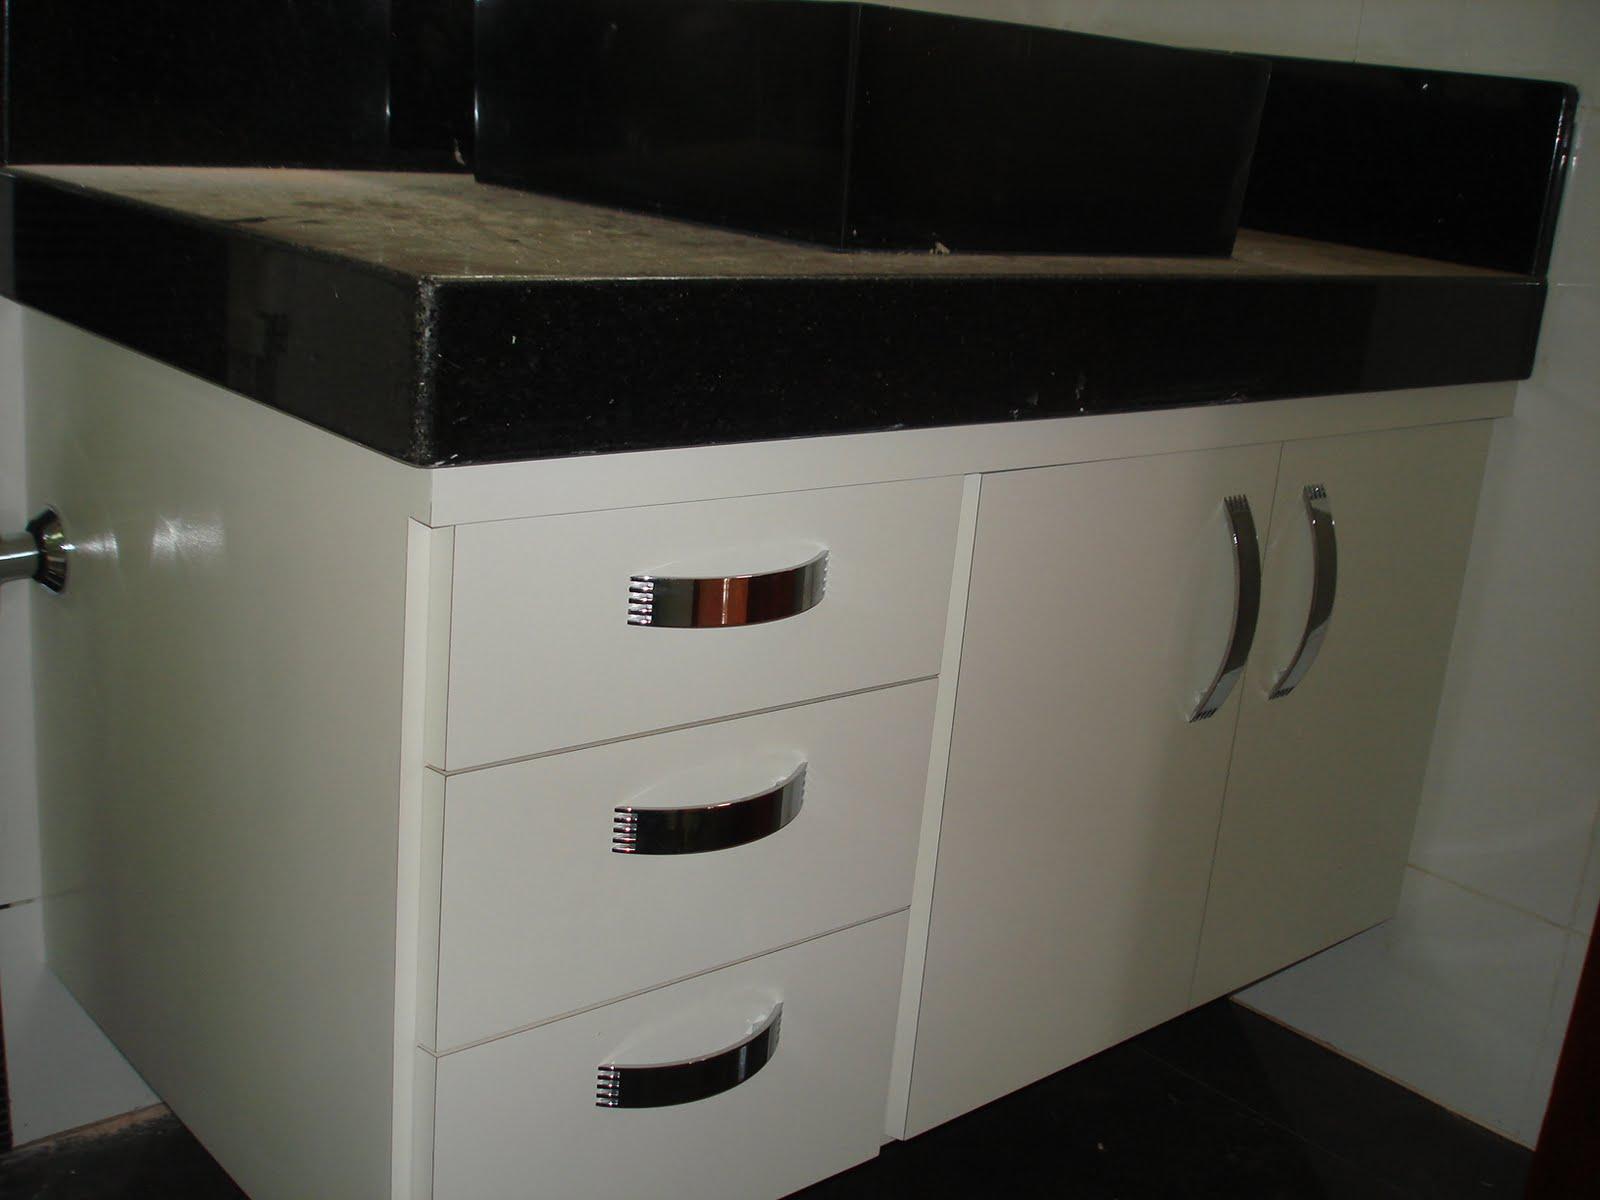 Marcenaria Taiobeiras LTDA: Gabinete para banheiro #575141 1600 1200